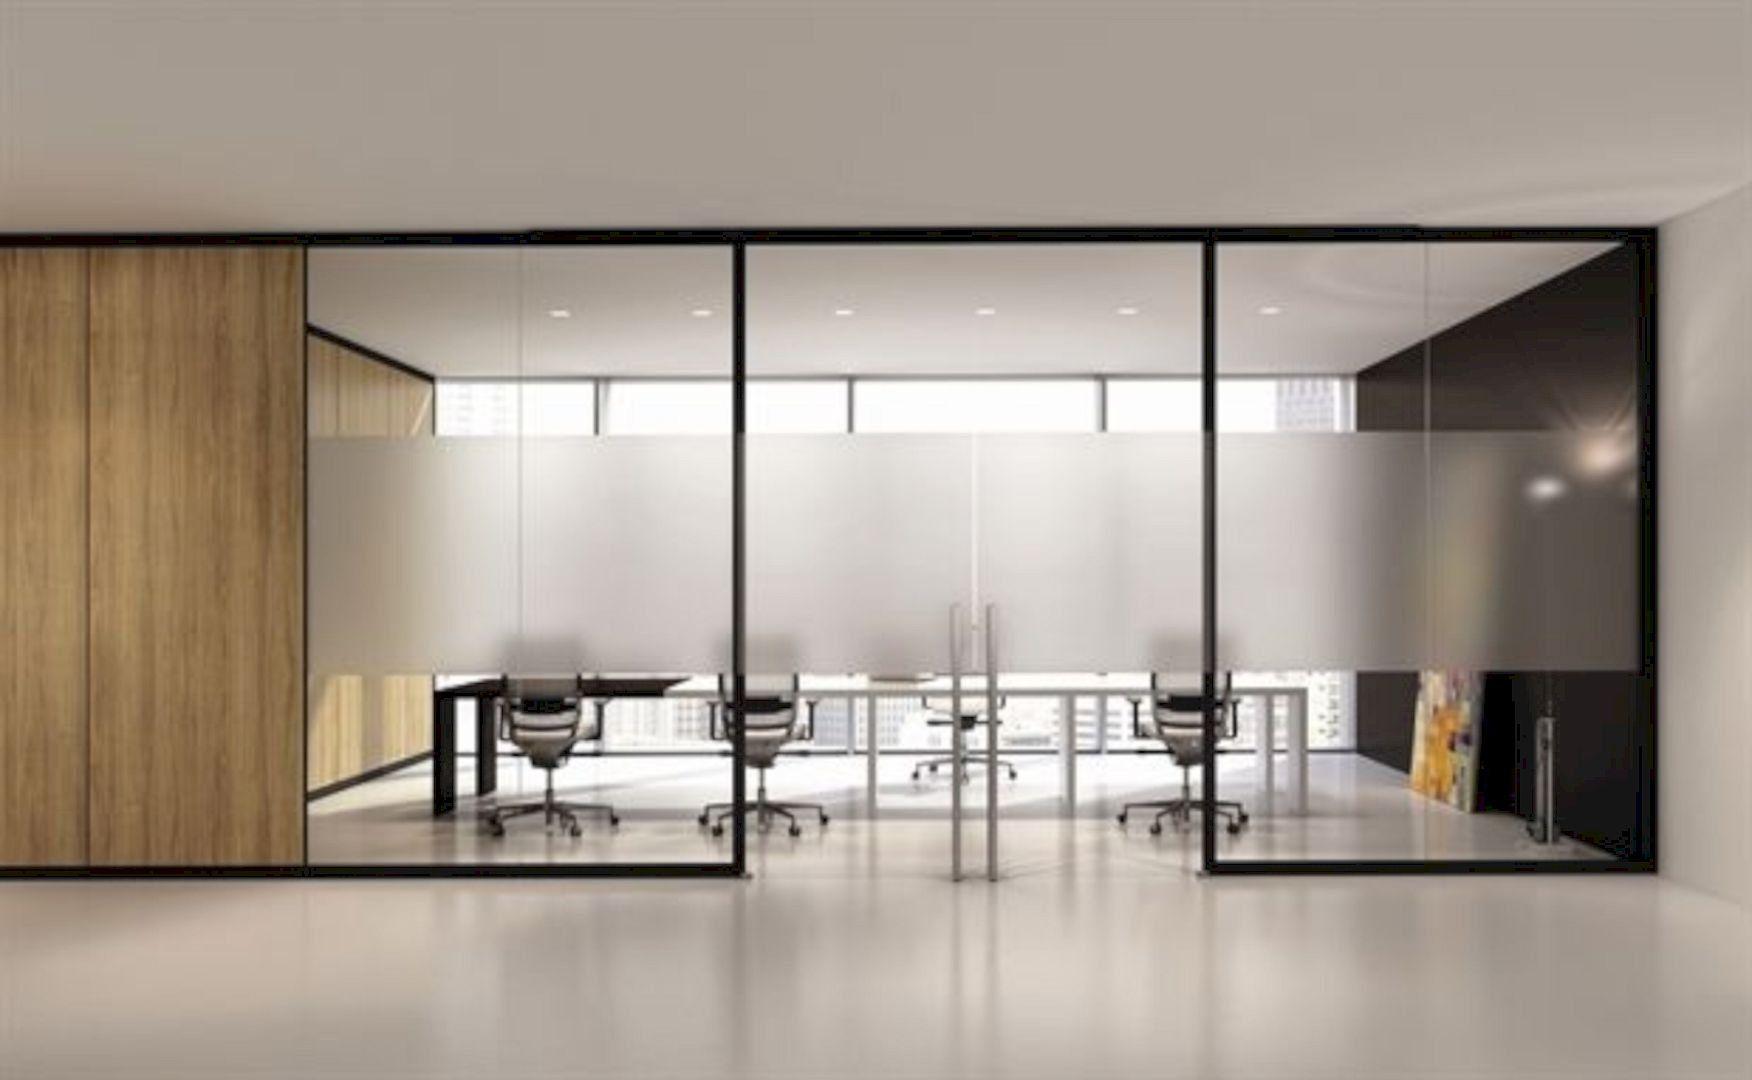 Office Interior: A Contemporary, Modern Workspace of the Design Studio | Futurist Architecture